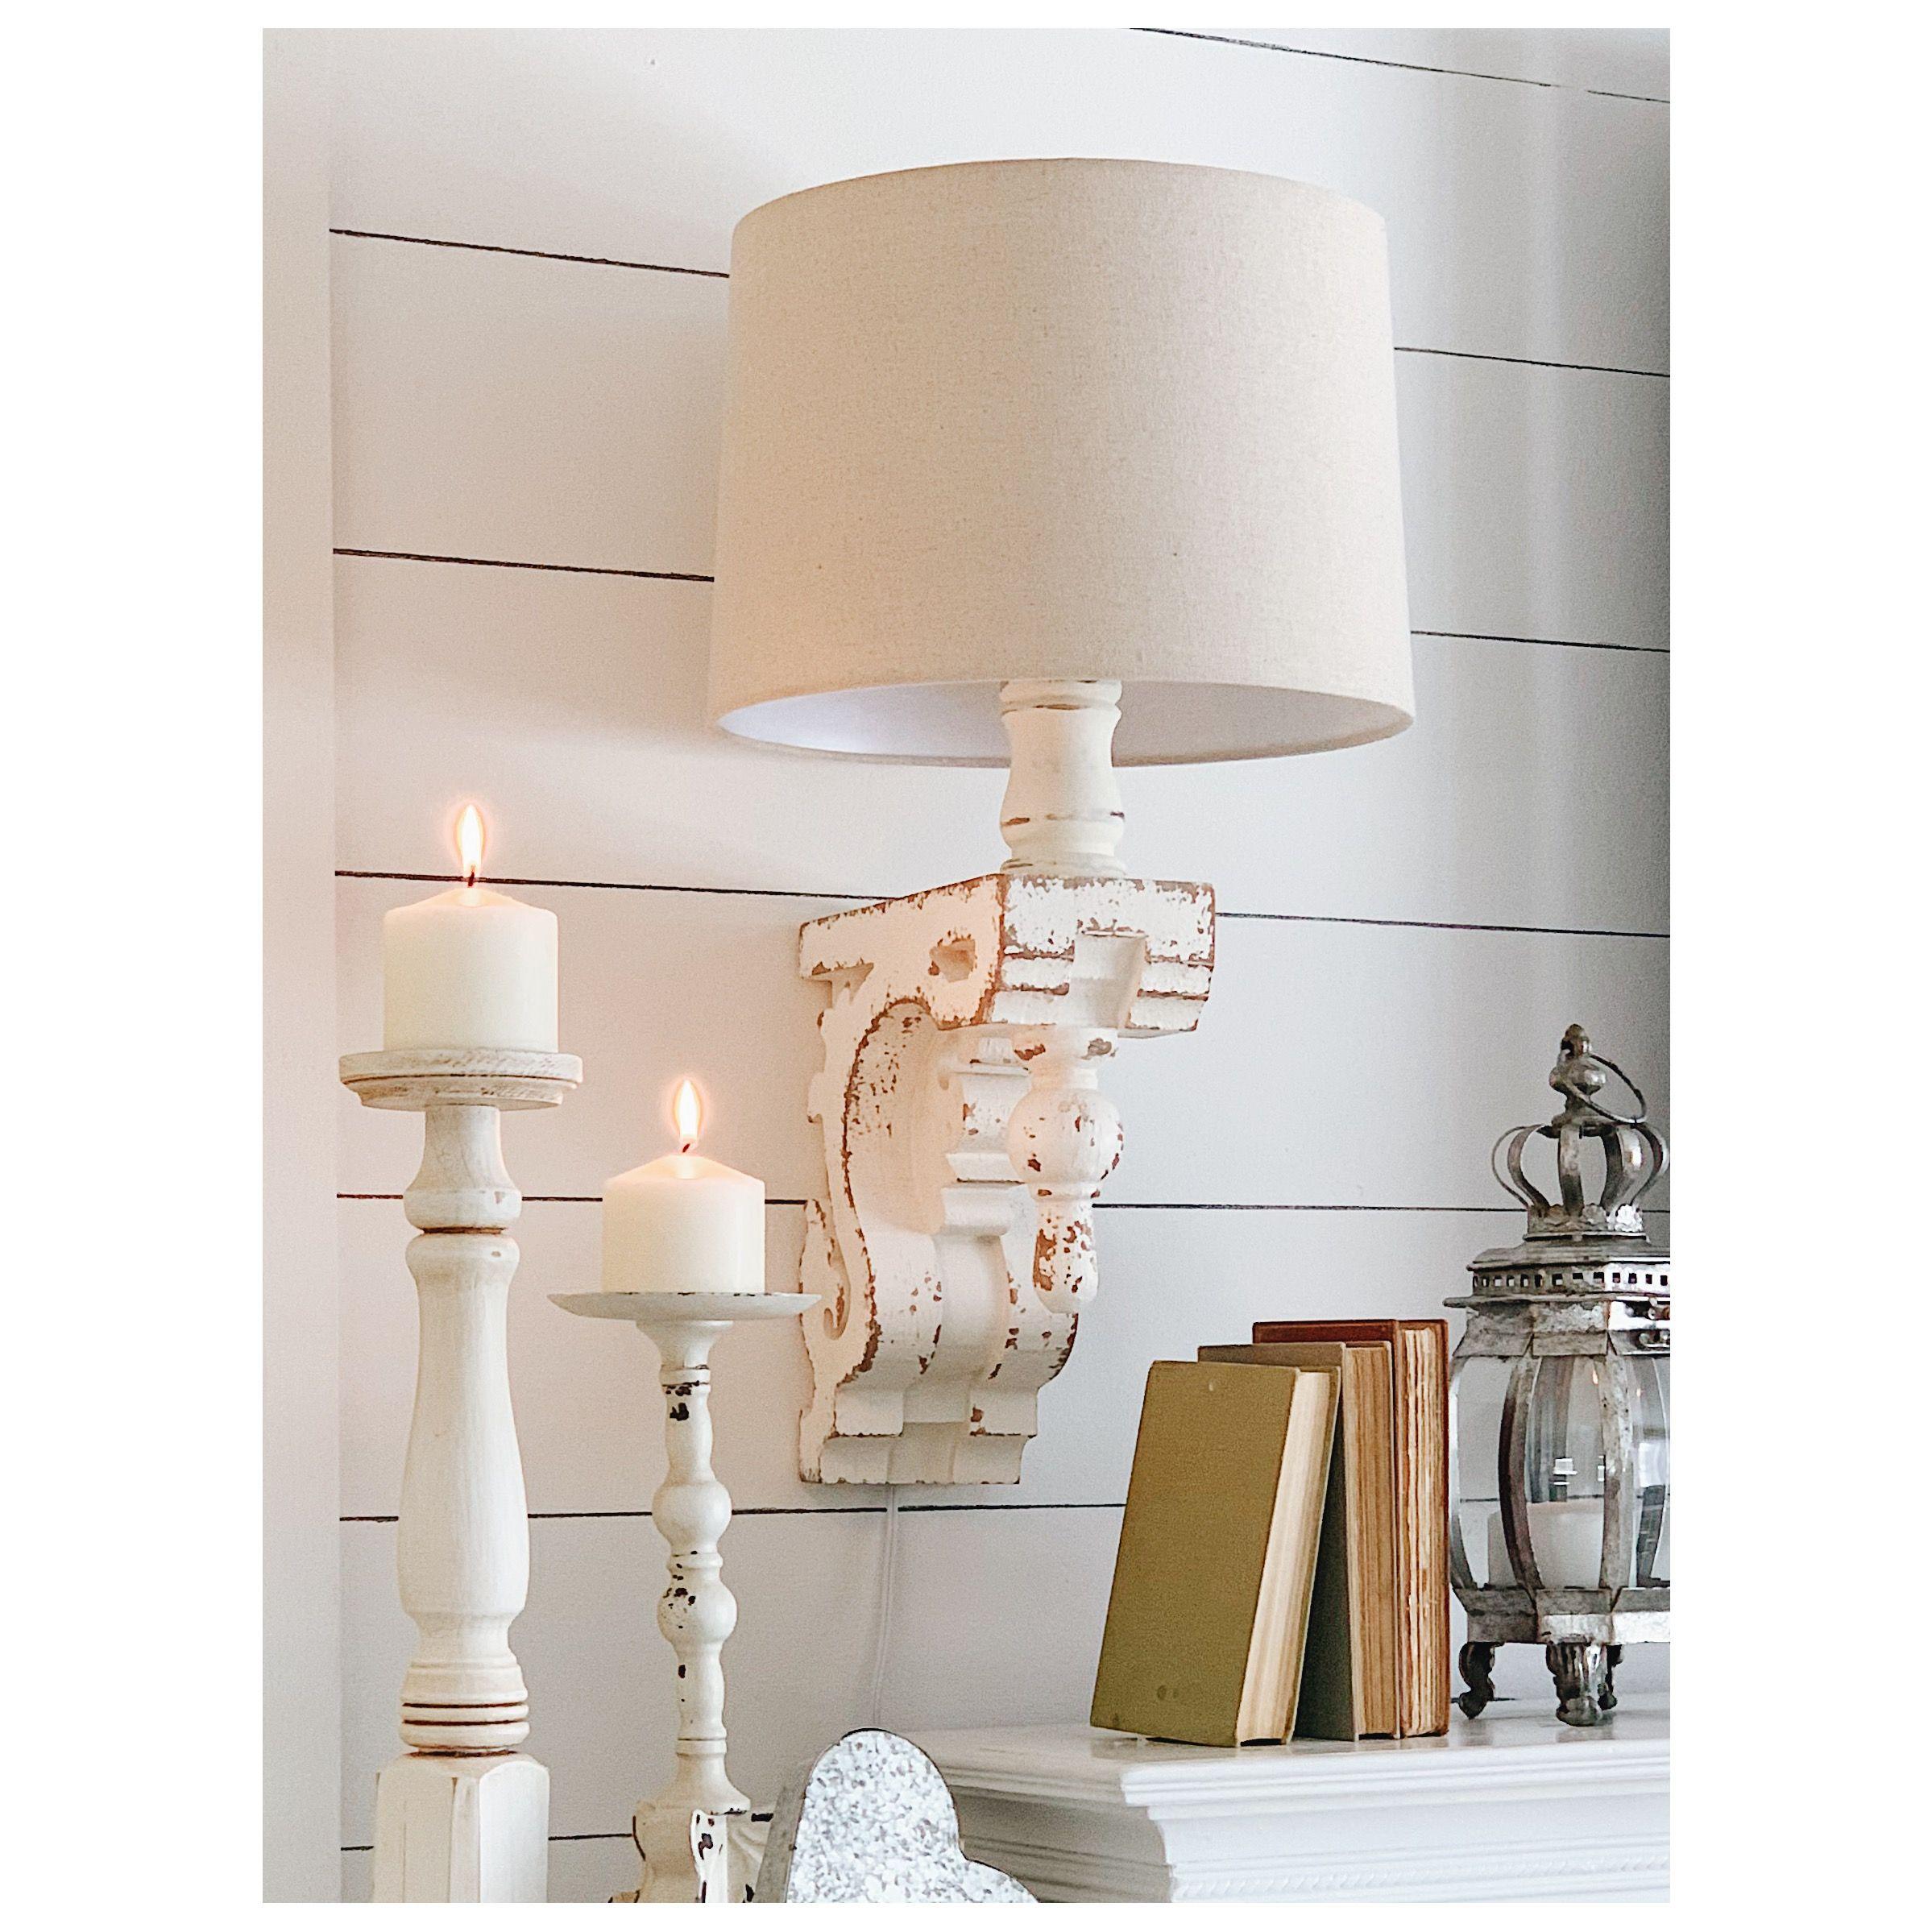 Diy Corbel Sconce Lamps Lianna Maria Diy Sconces Sconces Living Room Sconce Lamp